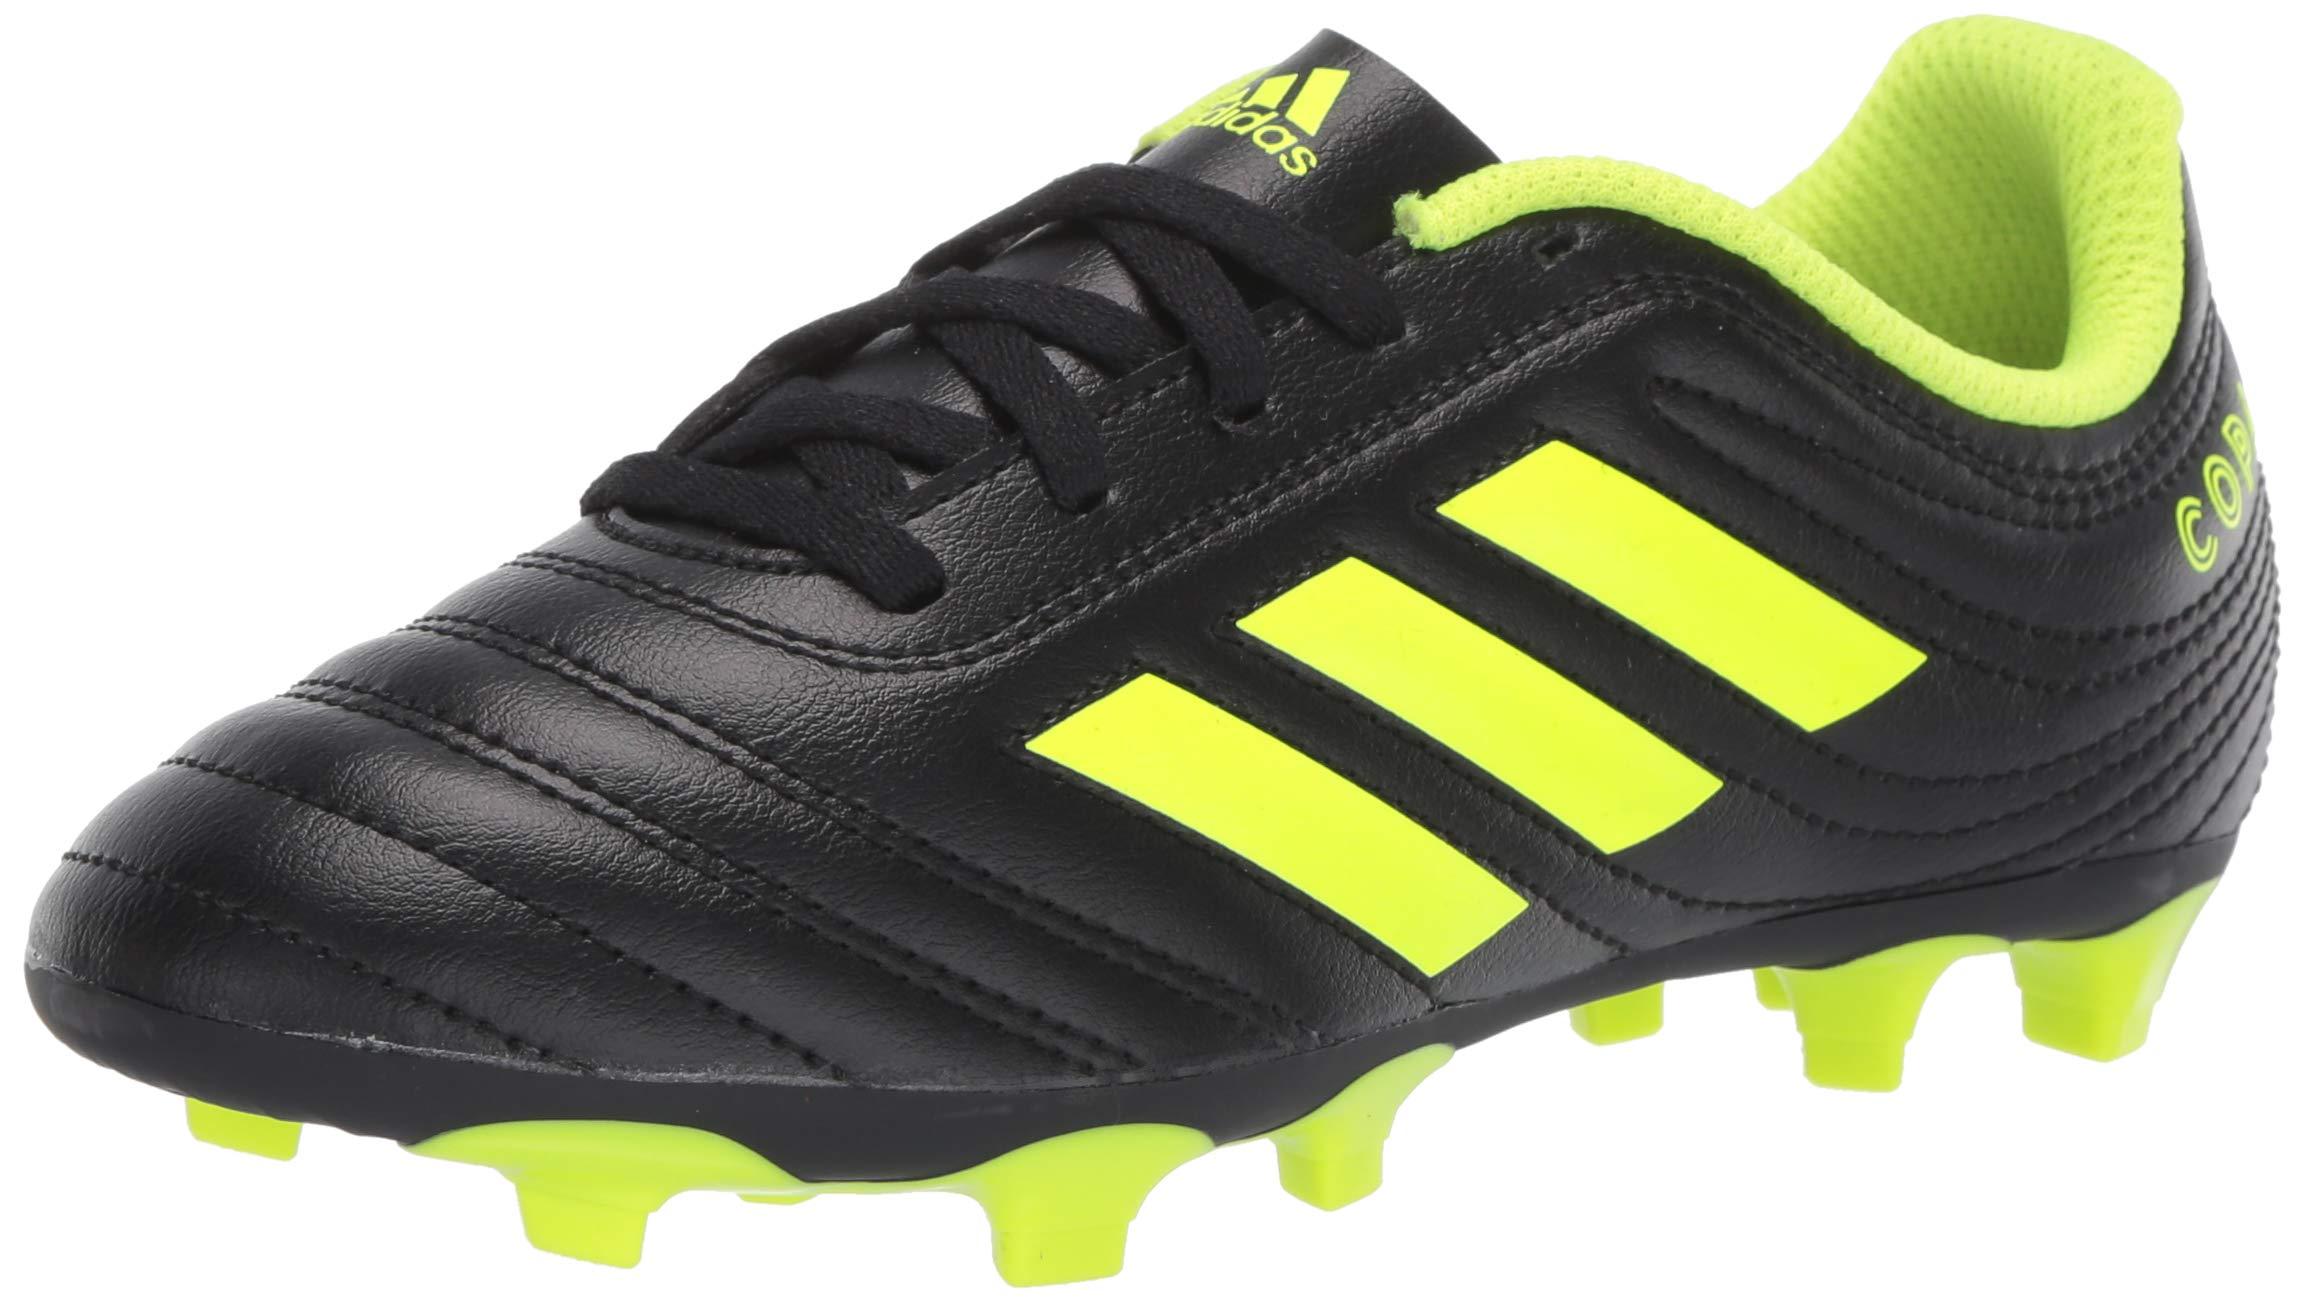 adidas Unisex Copa 19.4 Firm Ground, Black/Solar Yellow/Black, 13K M US Little Kid